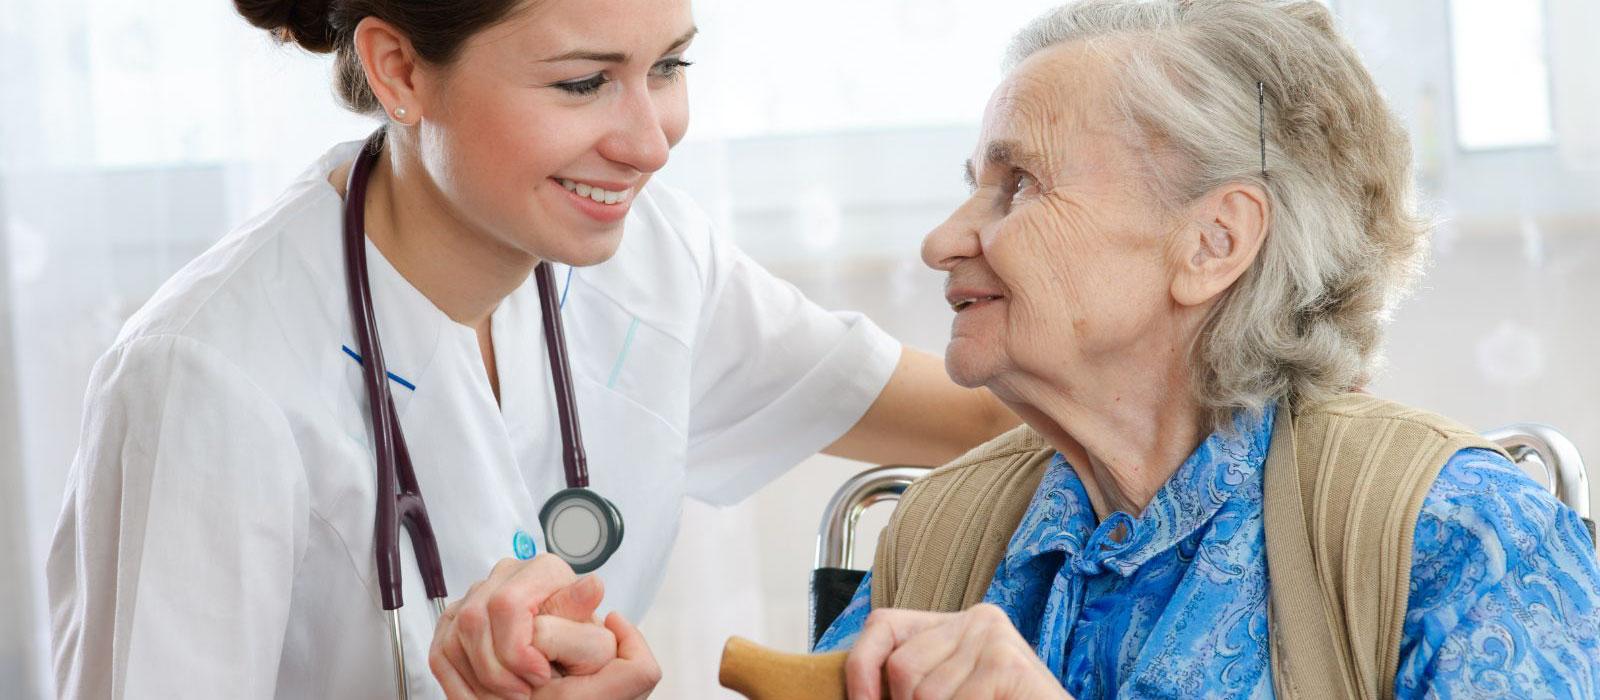 http://parastari24.com/به پرستاری ۲۴ خوش آمدید- معرفی پرستار کودک و پرستار سالمند و بیمار در منزل